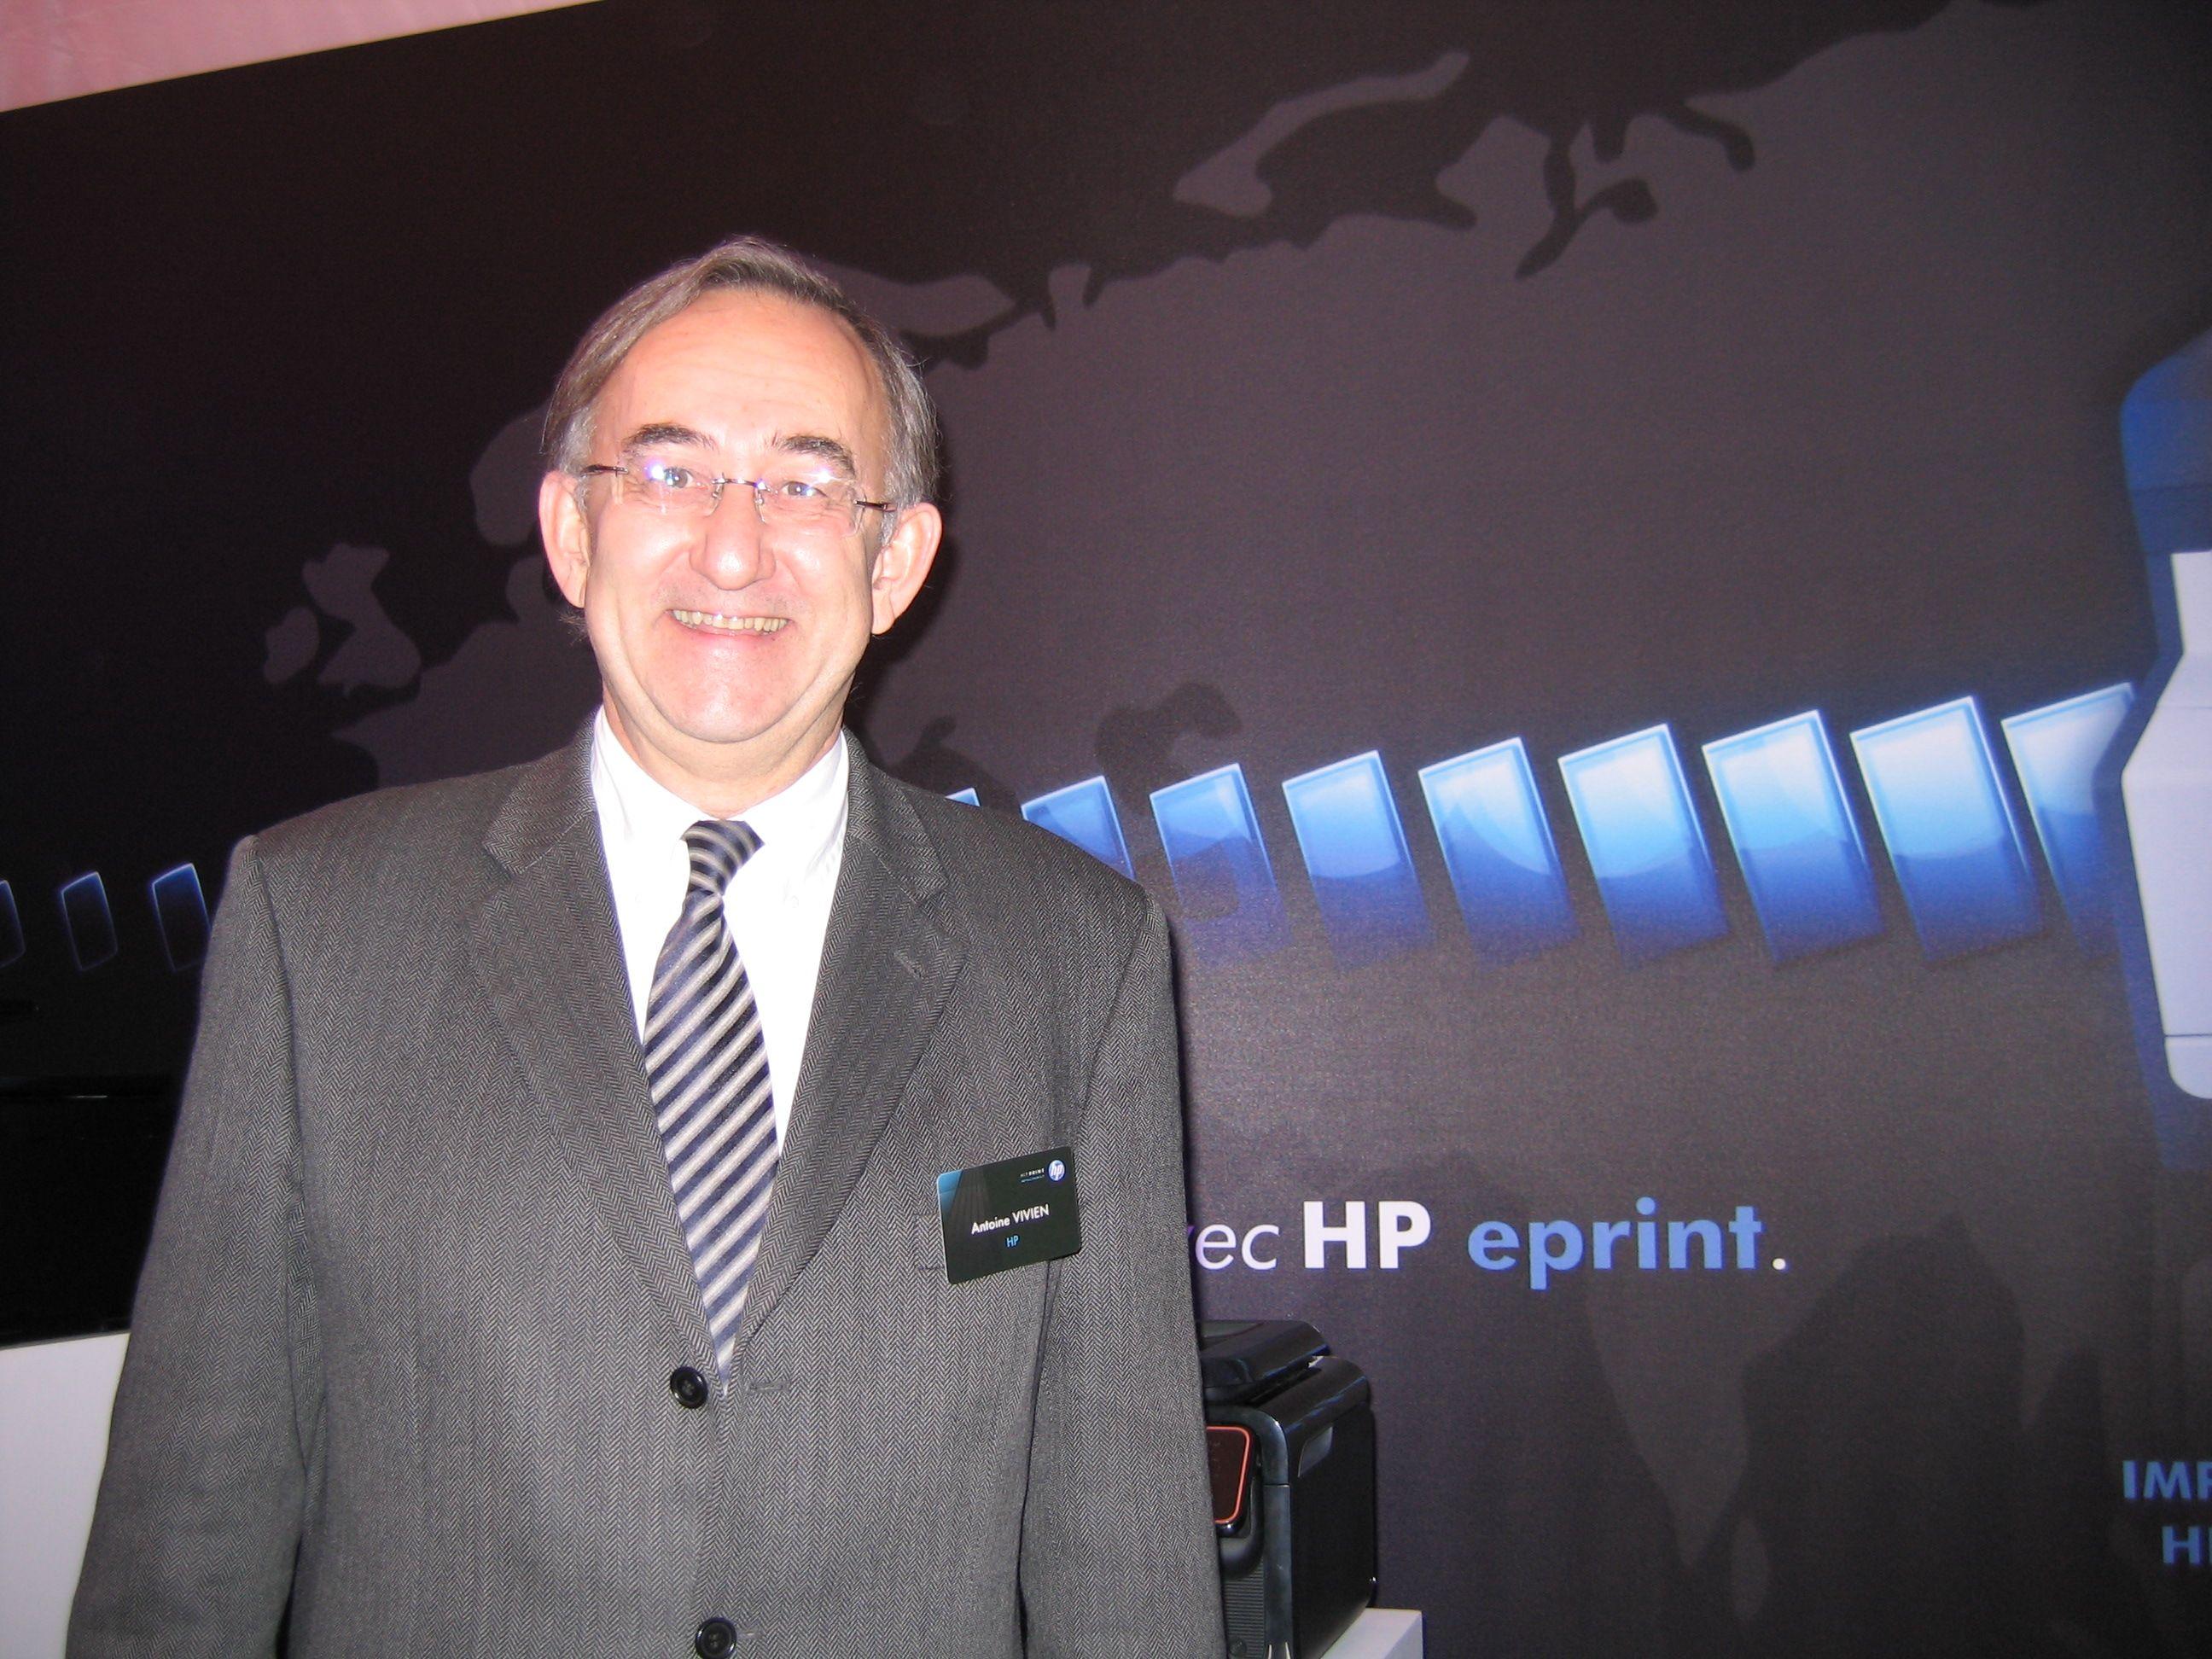 HP Imagerie Impression Antoine Vivien, vp